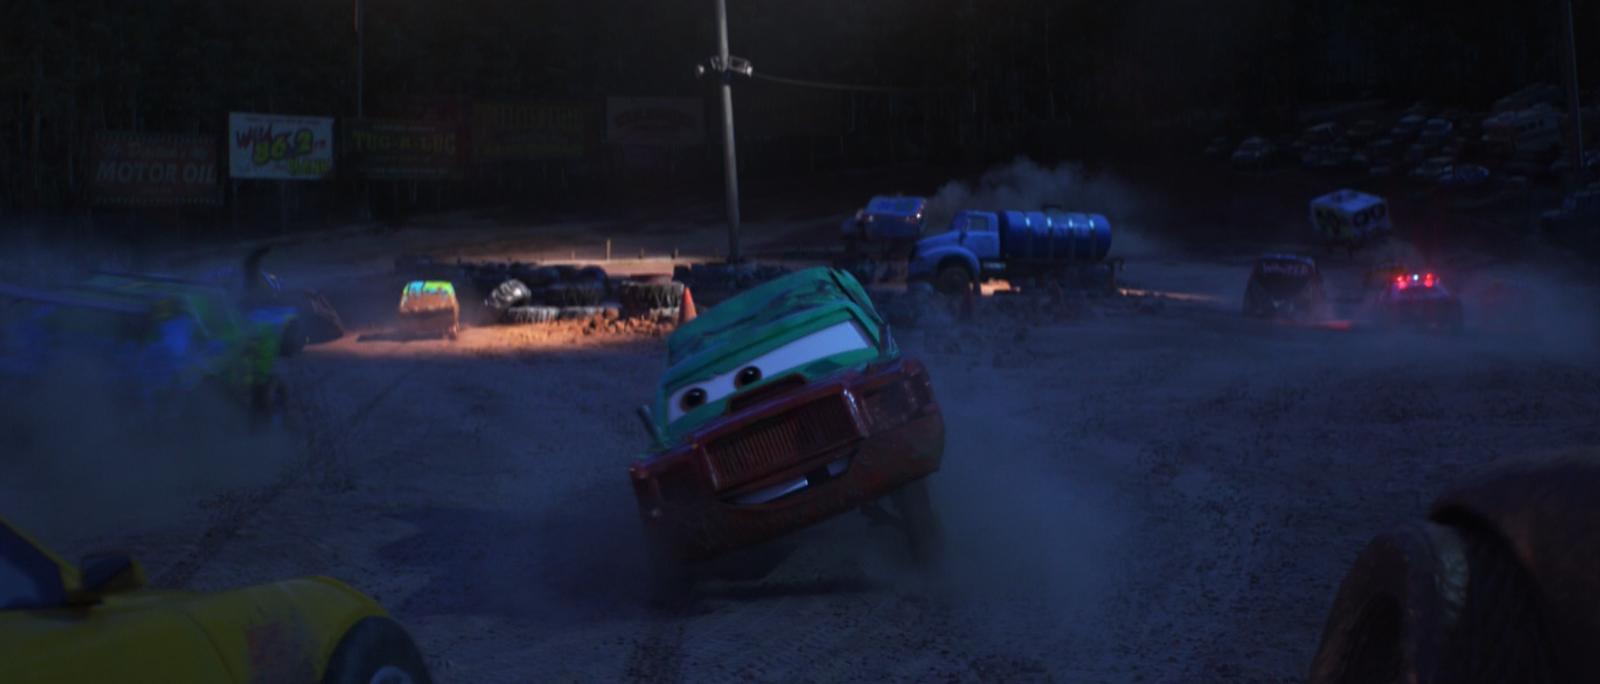 pixar cars 3 pileup diecast